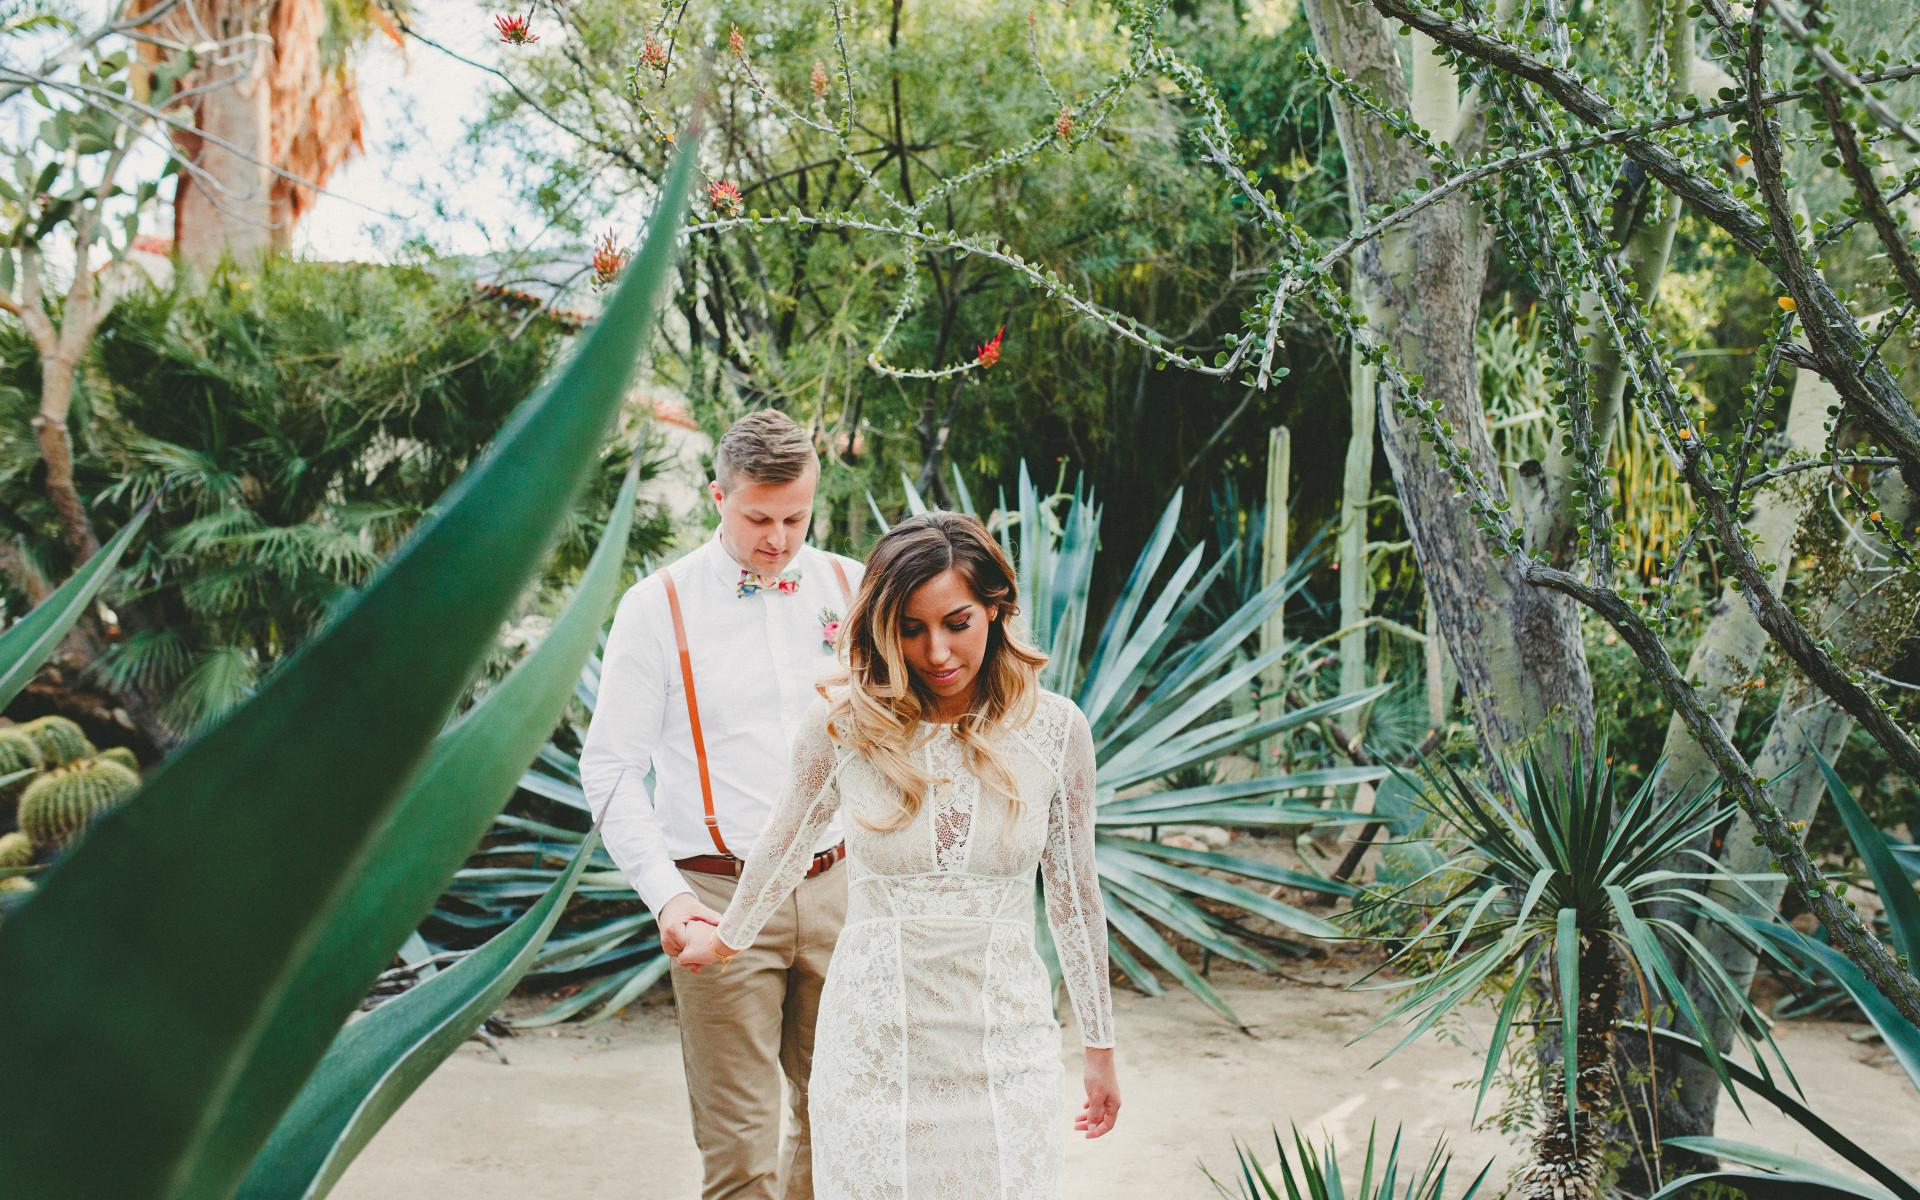 Wedding At Moortens Botanical Garden